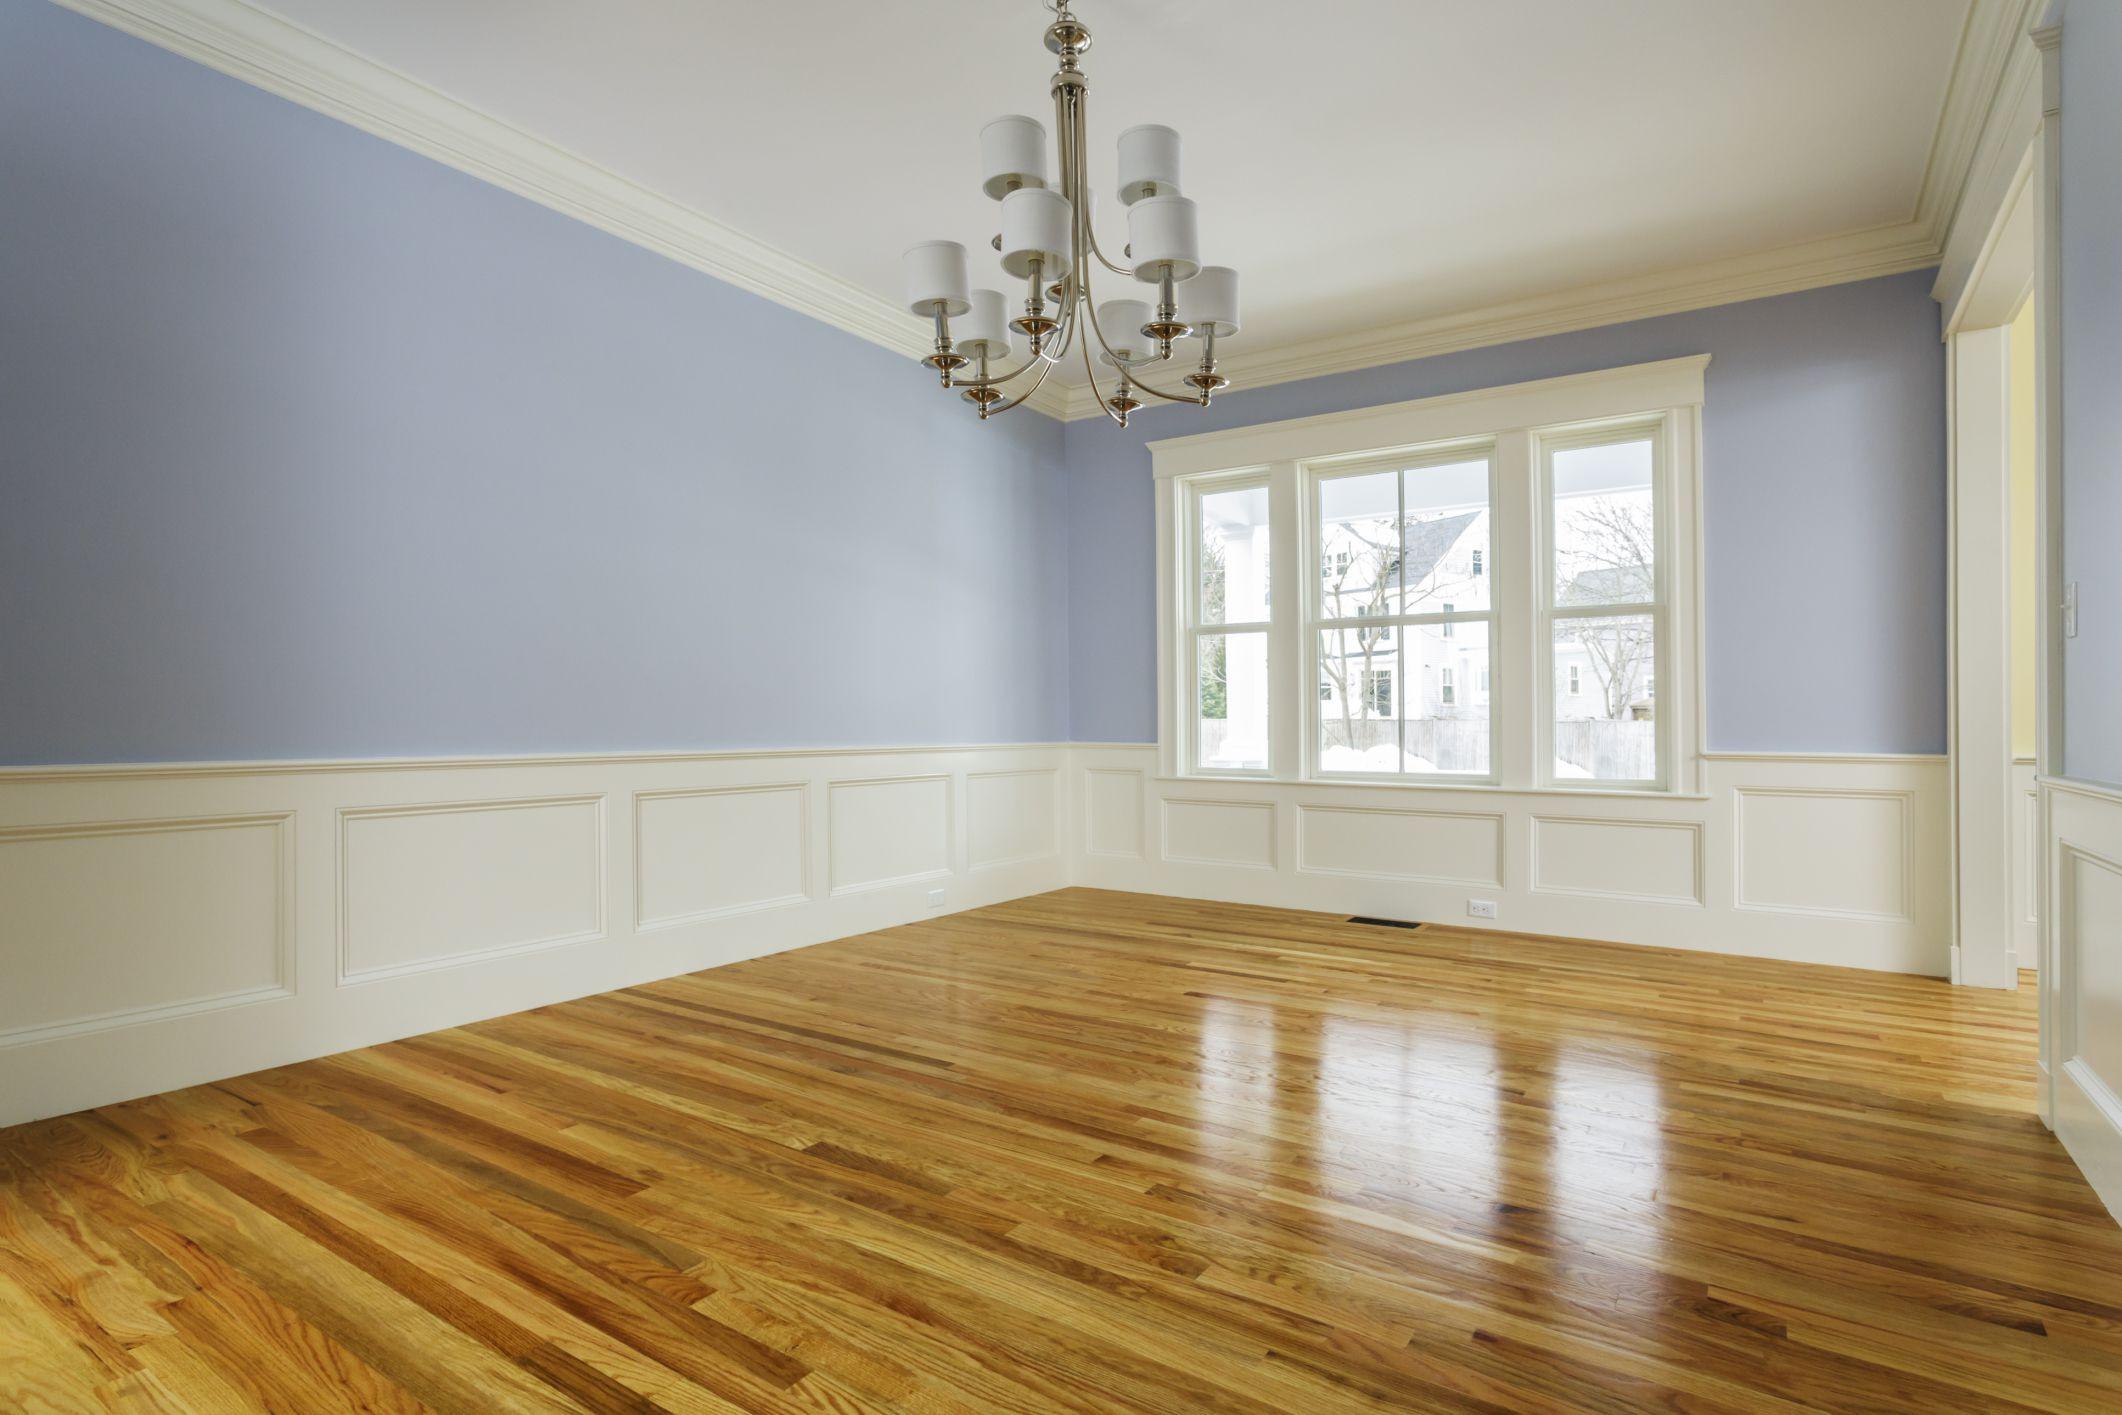 walnut hardwood flooring cost of the cost to refinish hardwood floors regarding 168686572 highres 56a2fd773df78cf7727b6cb3